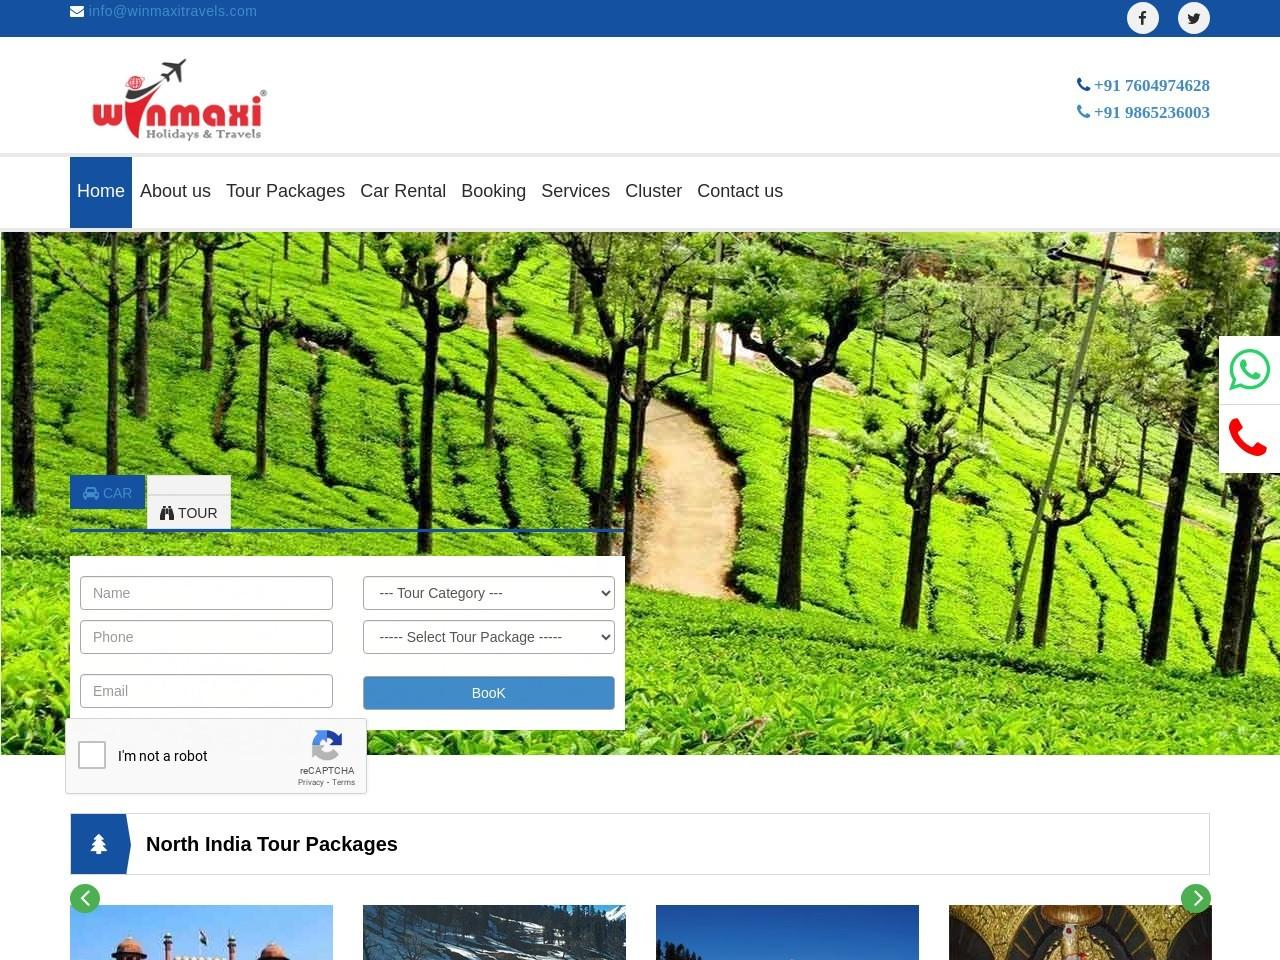 Mahabaleshwar Panchgani Tour Packages from Coimbatore